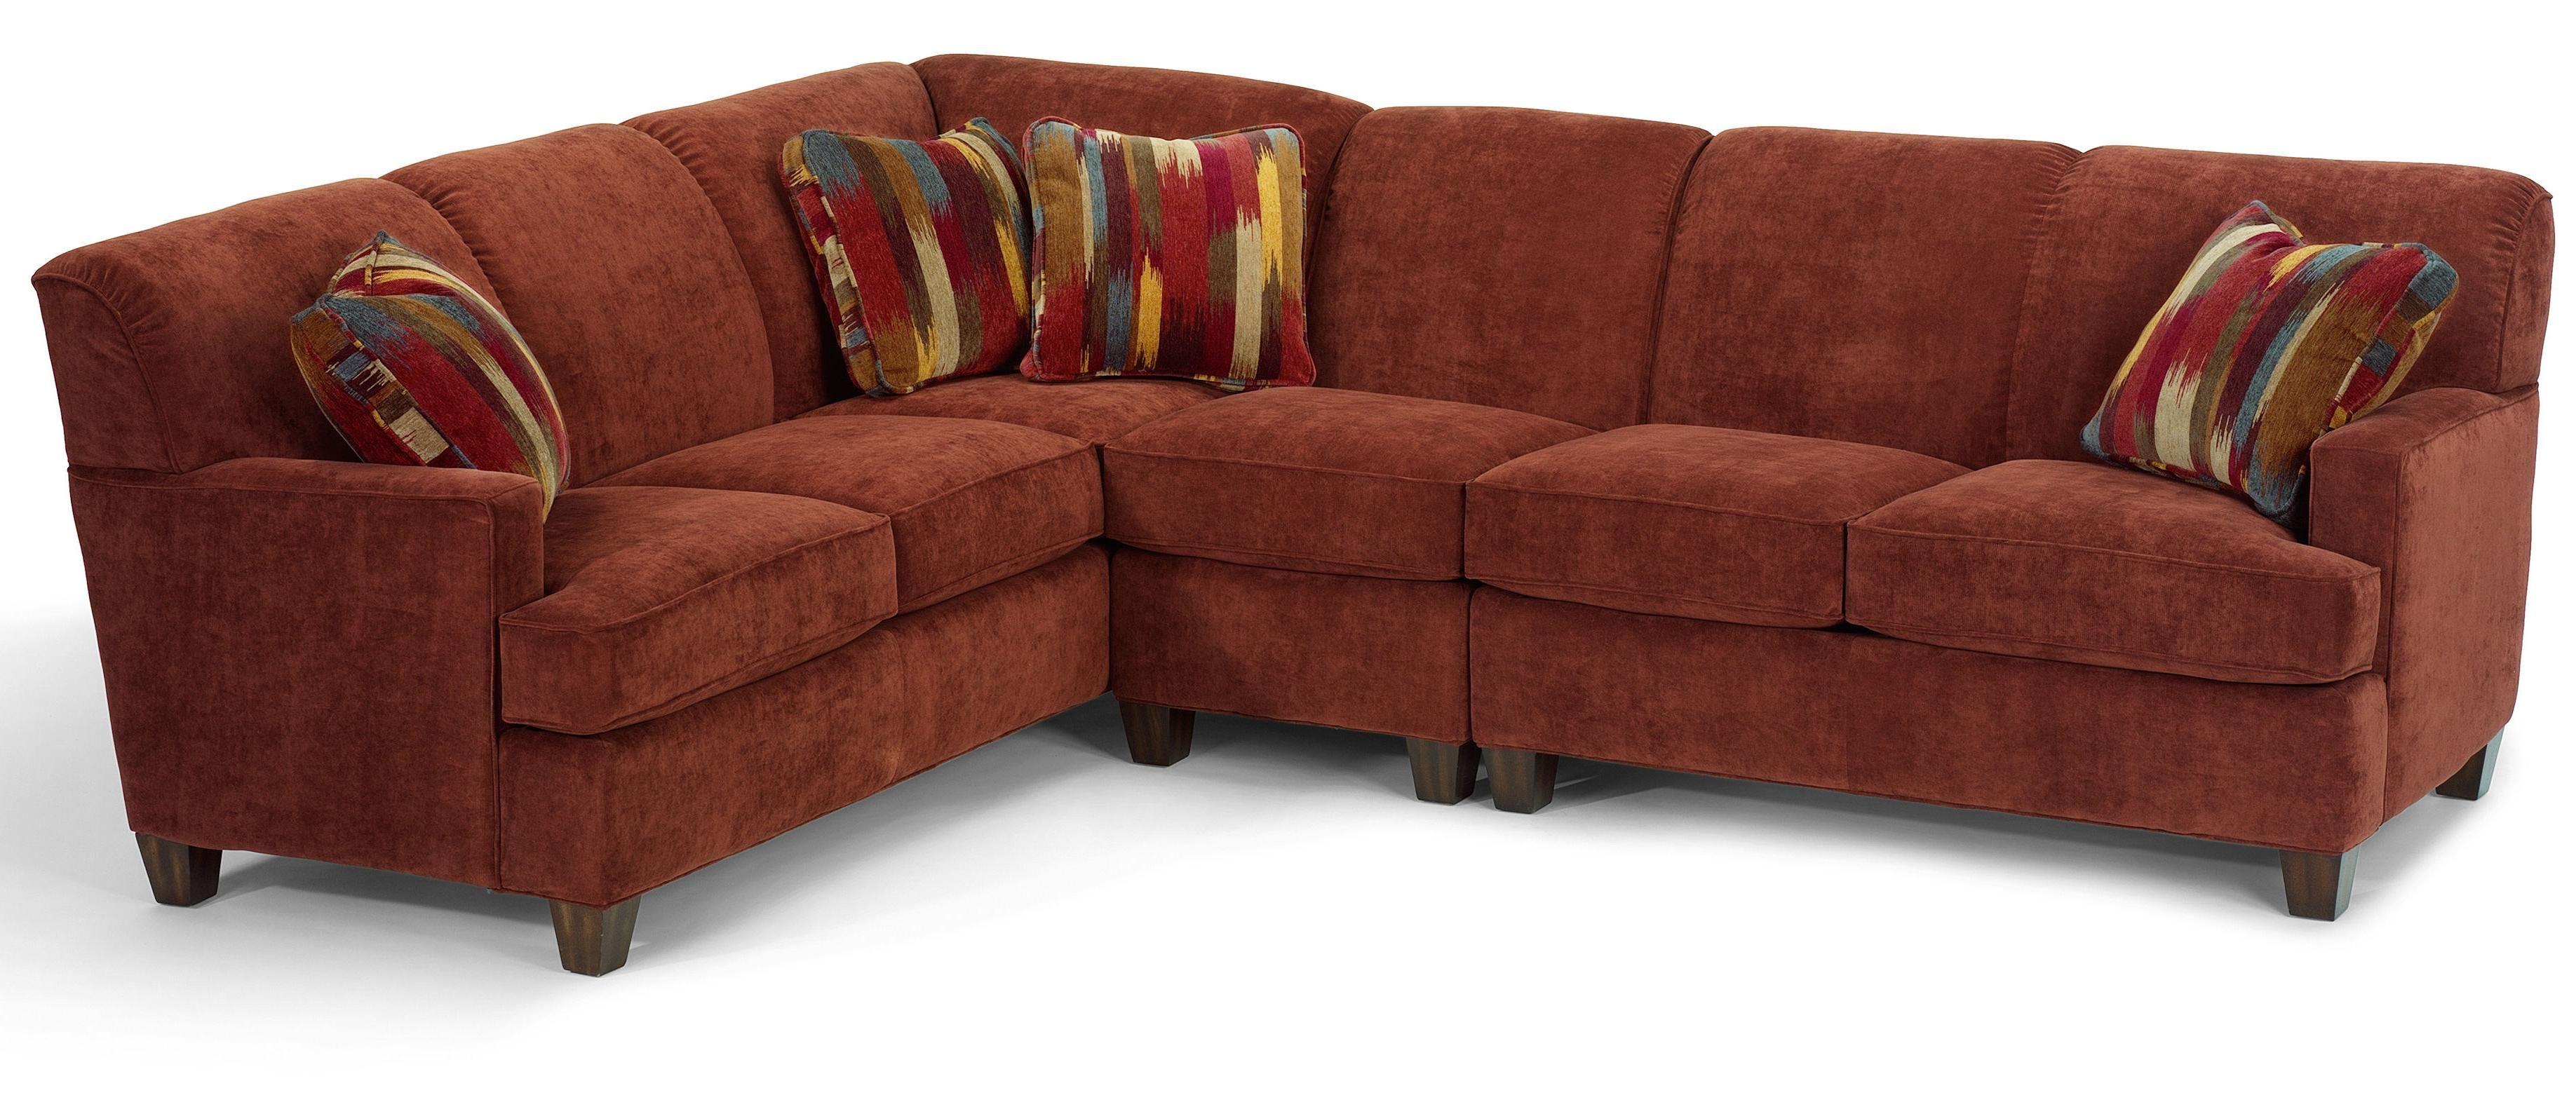 Swell Dempsey Contemporary 3 Piece Sectional Sofa With Raf Creativecarmelina Interior Chair Design Creativecarmelinacom